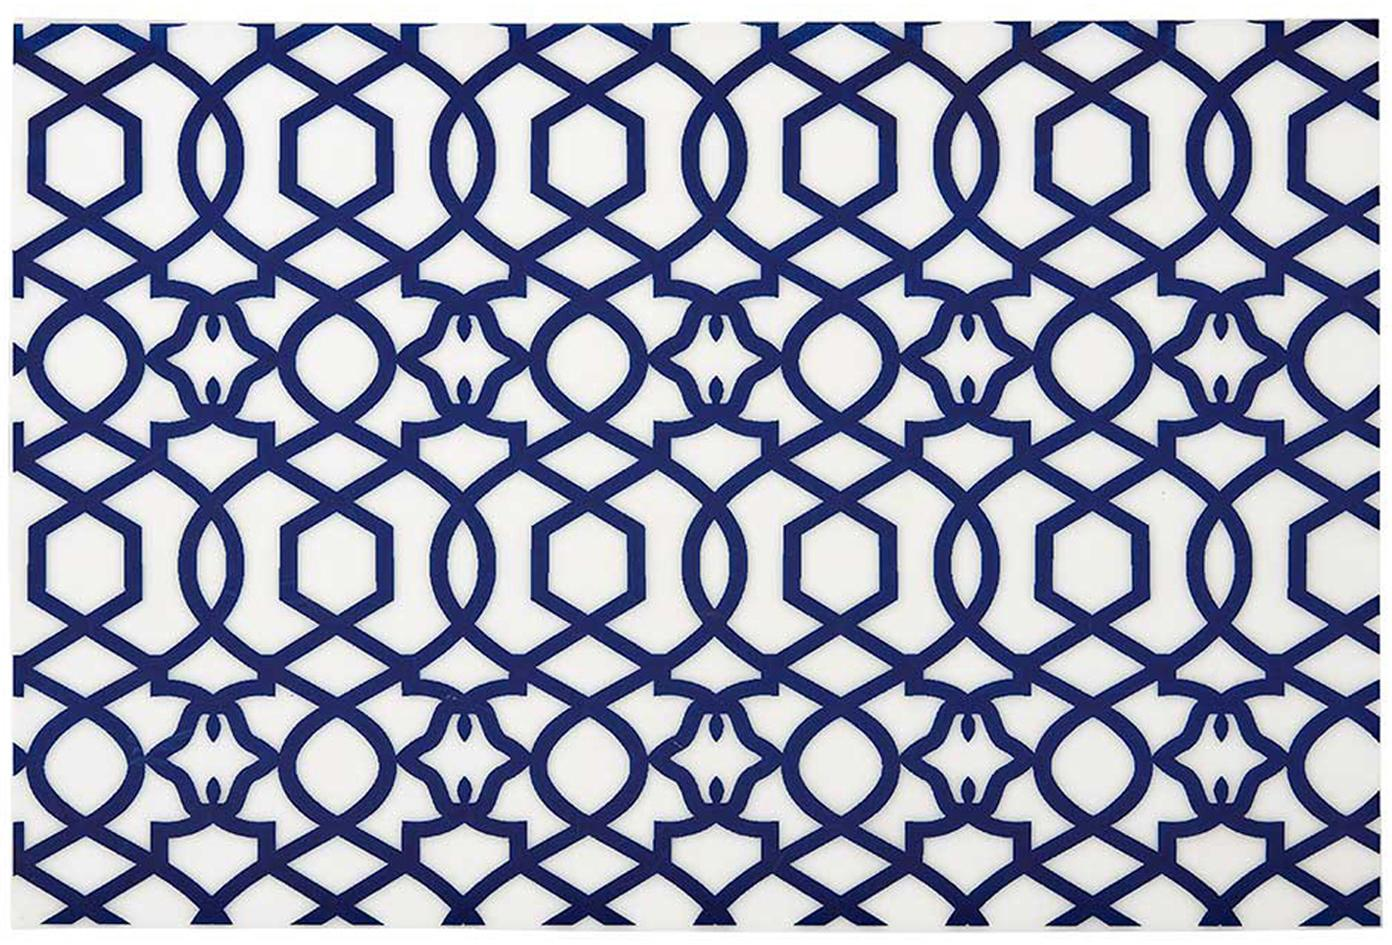 Tovaglietta americana Tropic 4 pz, Materiale sintetico (PVC), Blu scuro, Larg. 30 x Lung. 45 cm